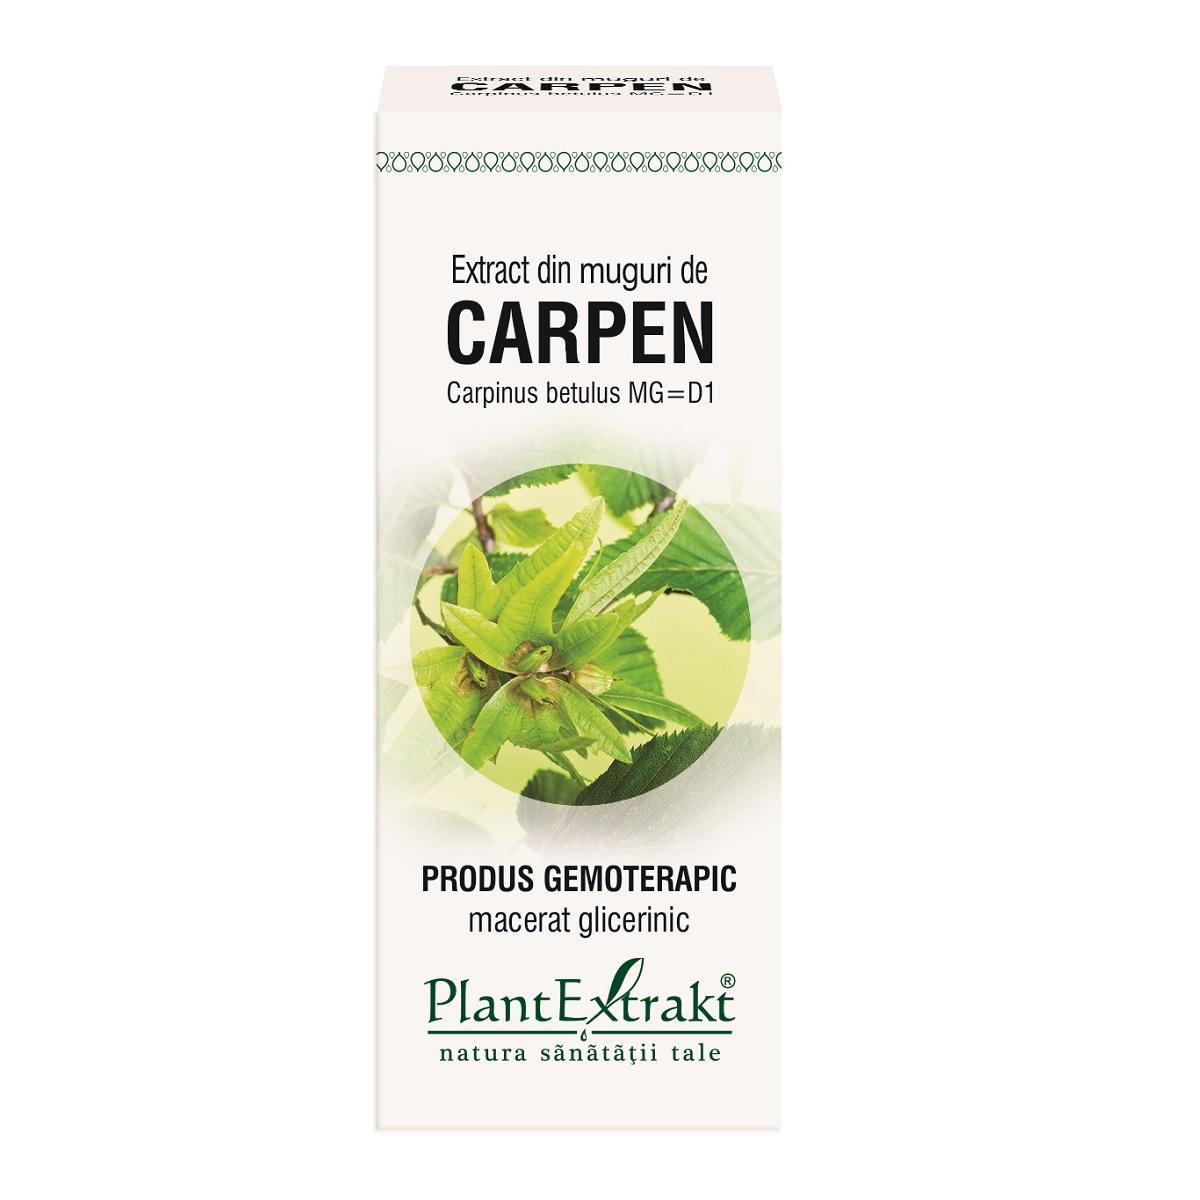 Extract din muguri de Carpen, 50 ml, Plant Extrakt